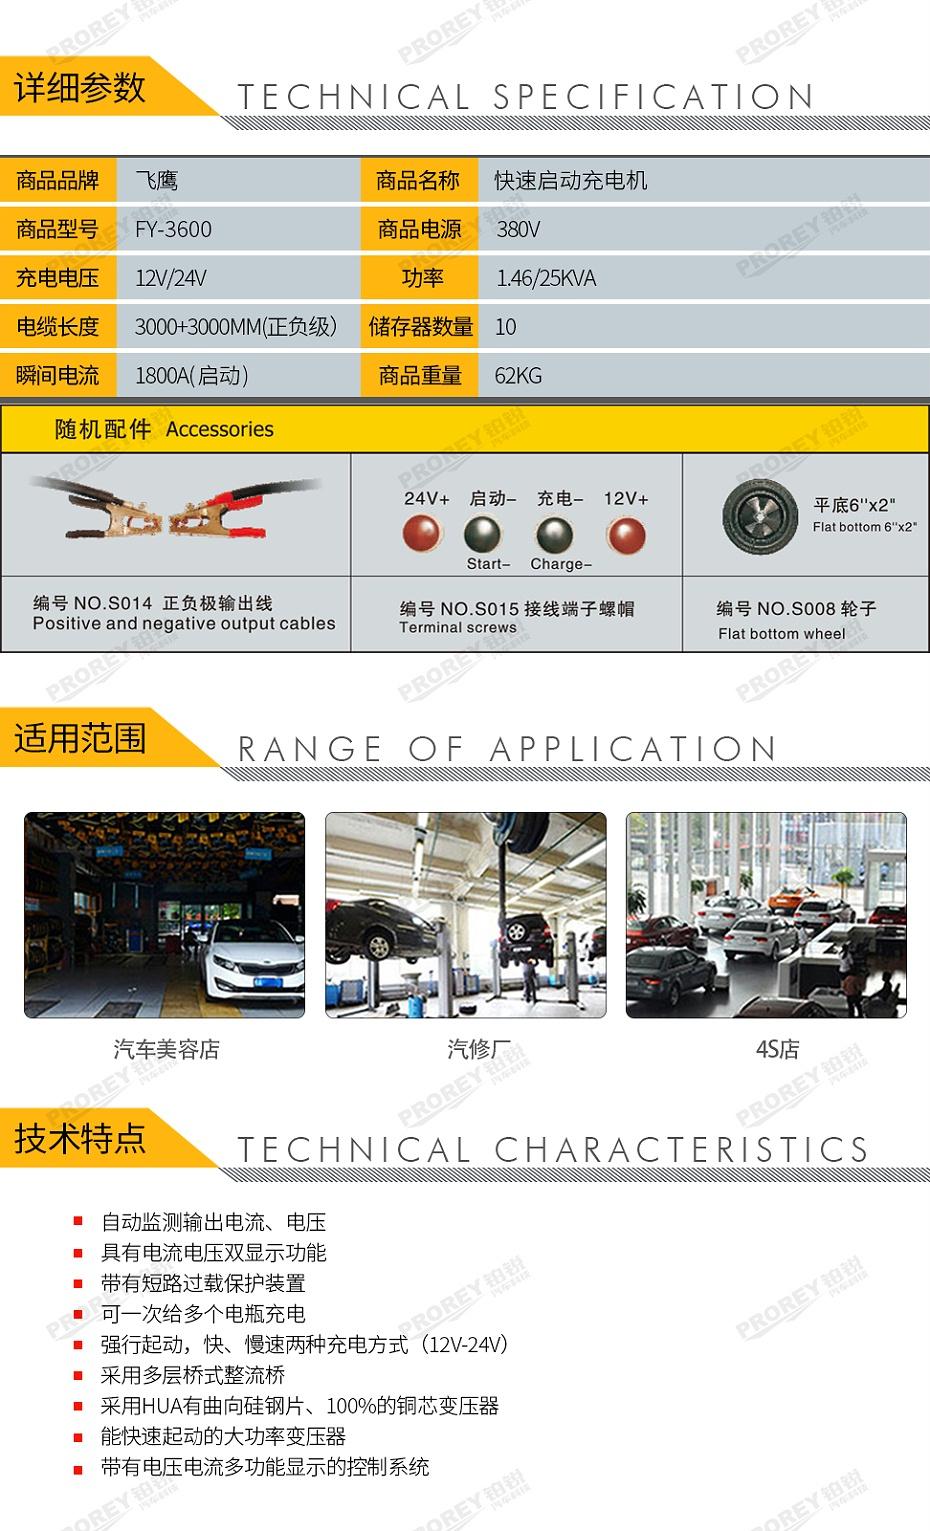 GW-170010075-飞鹰 FY-3600 起动充电机-2